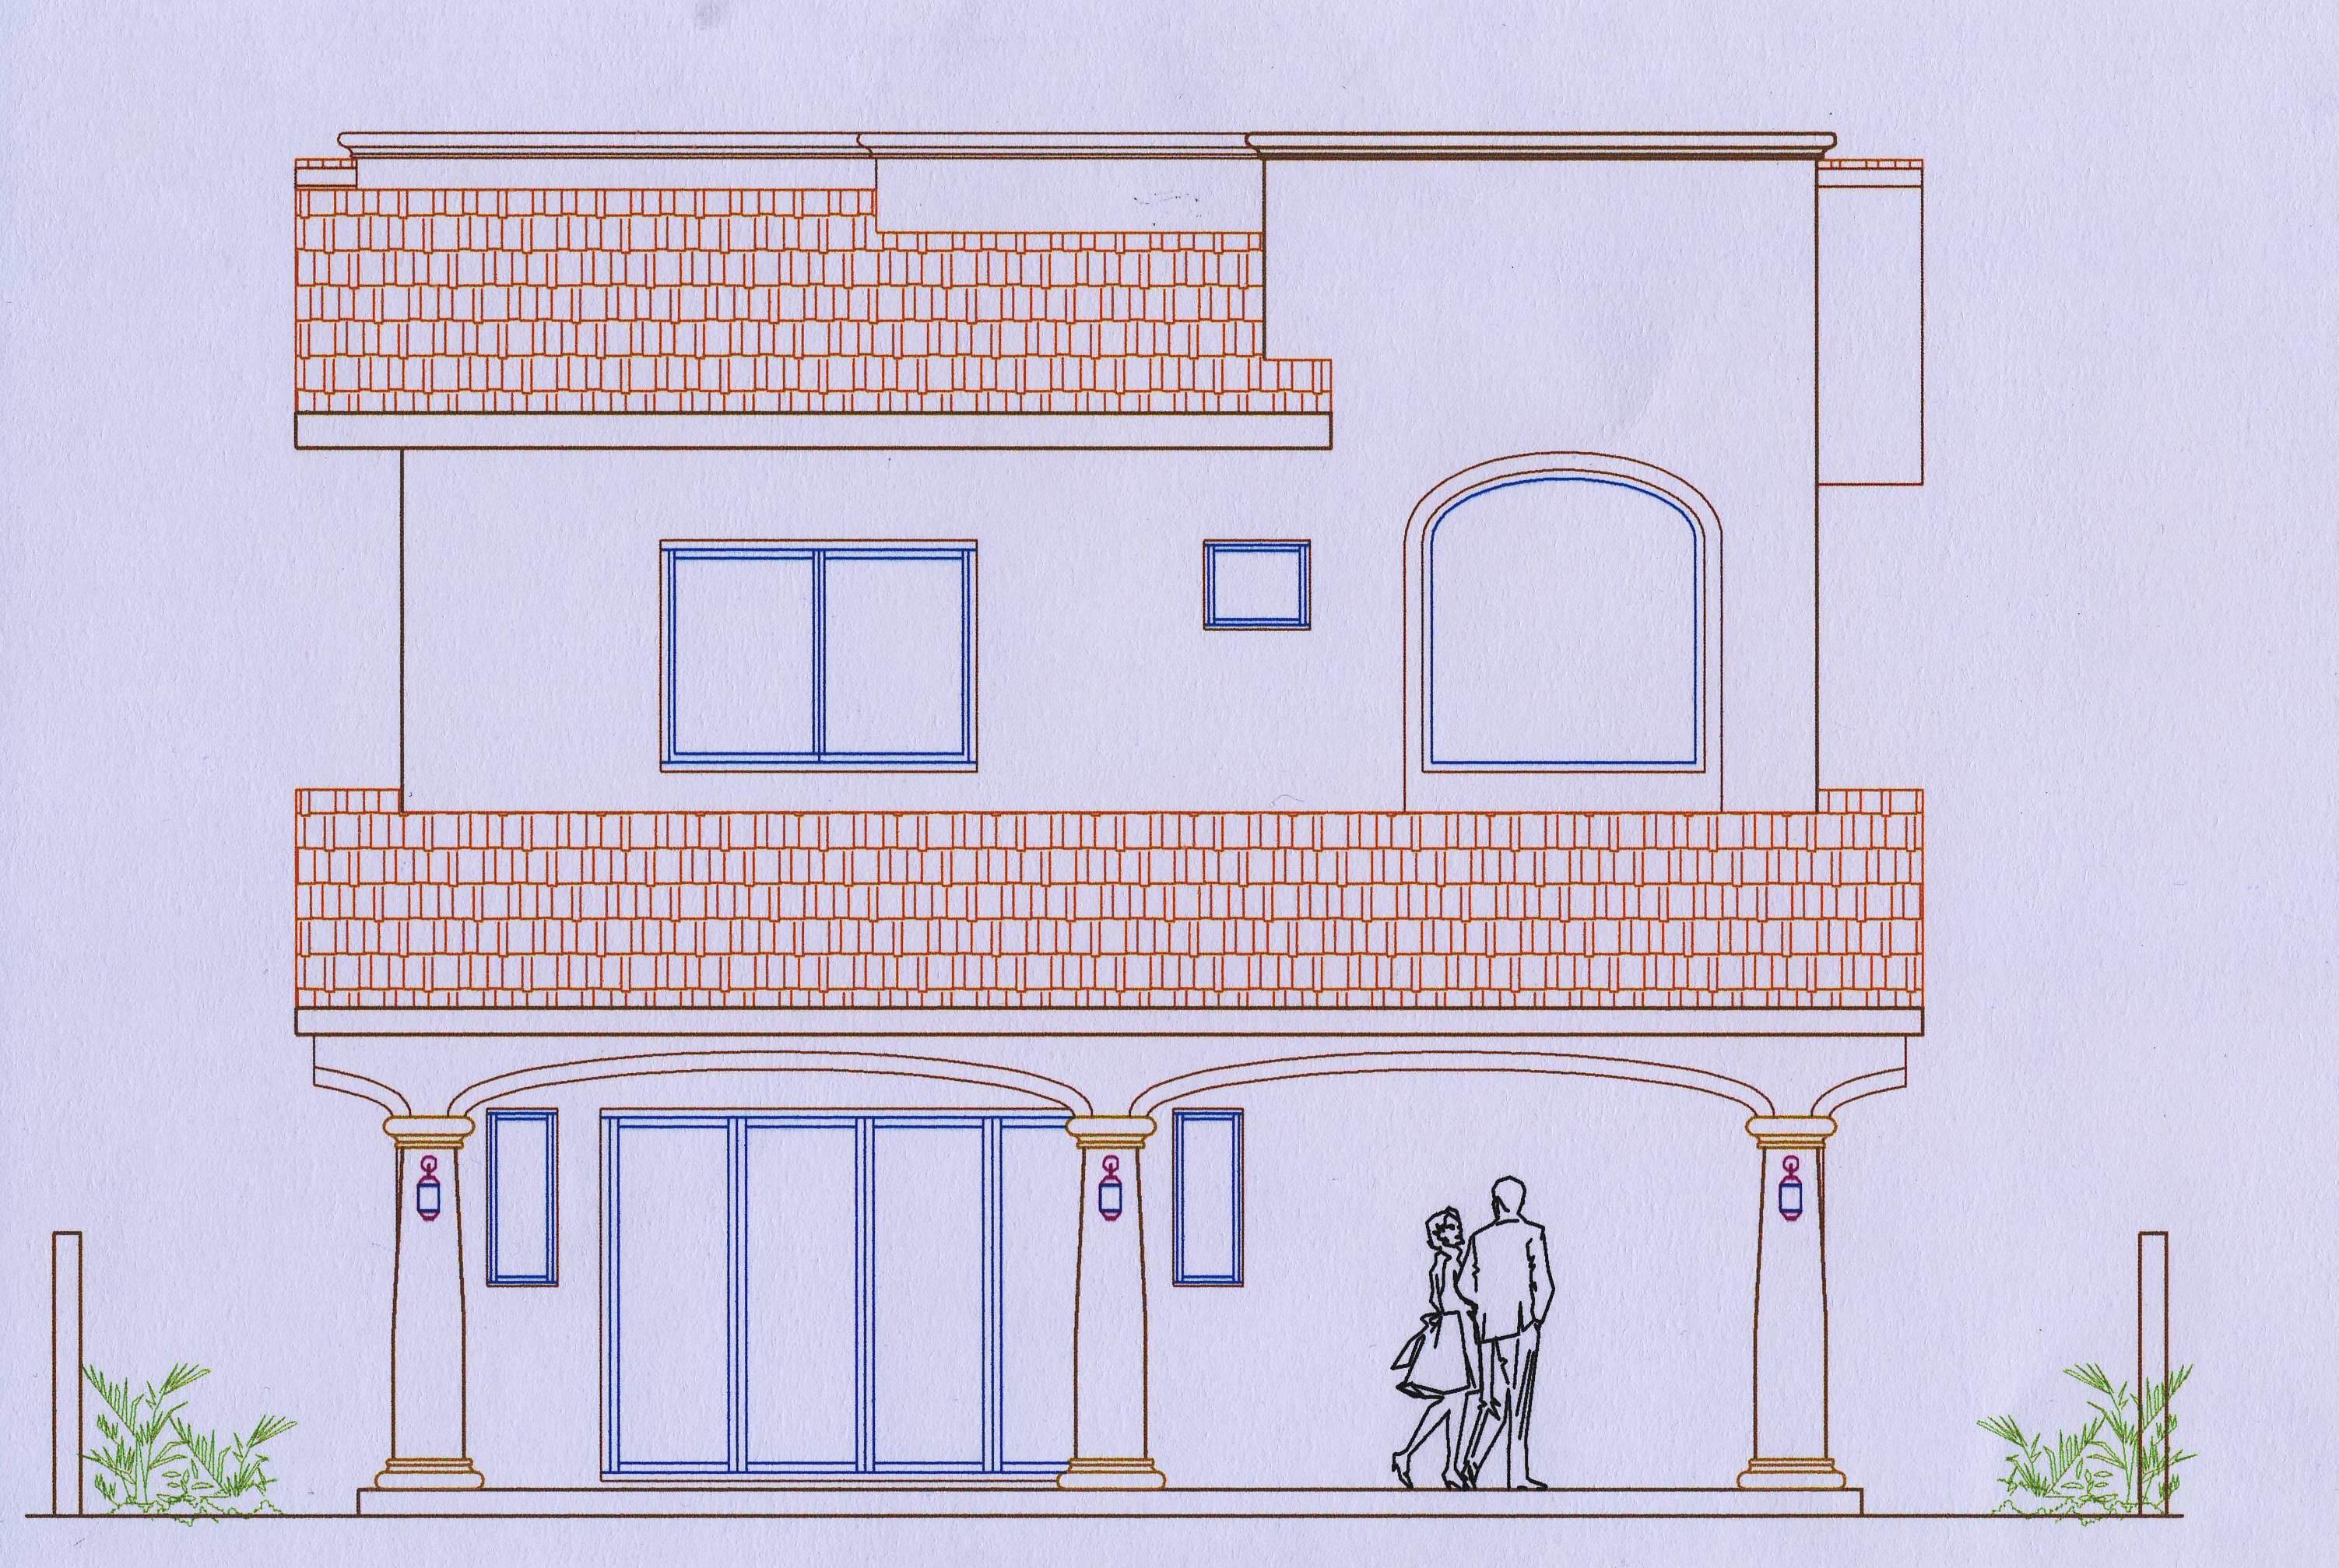 Design My House Floor Plan mazing Luxury Home Design - ^